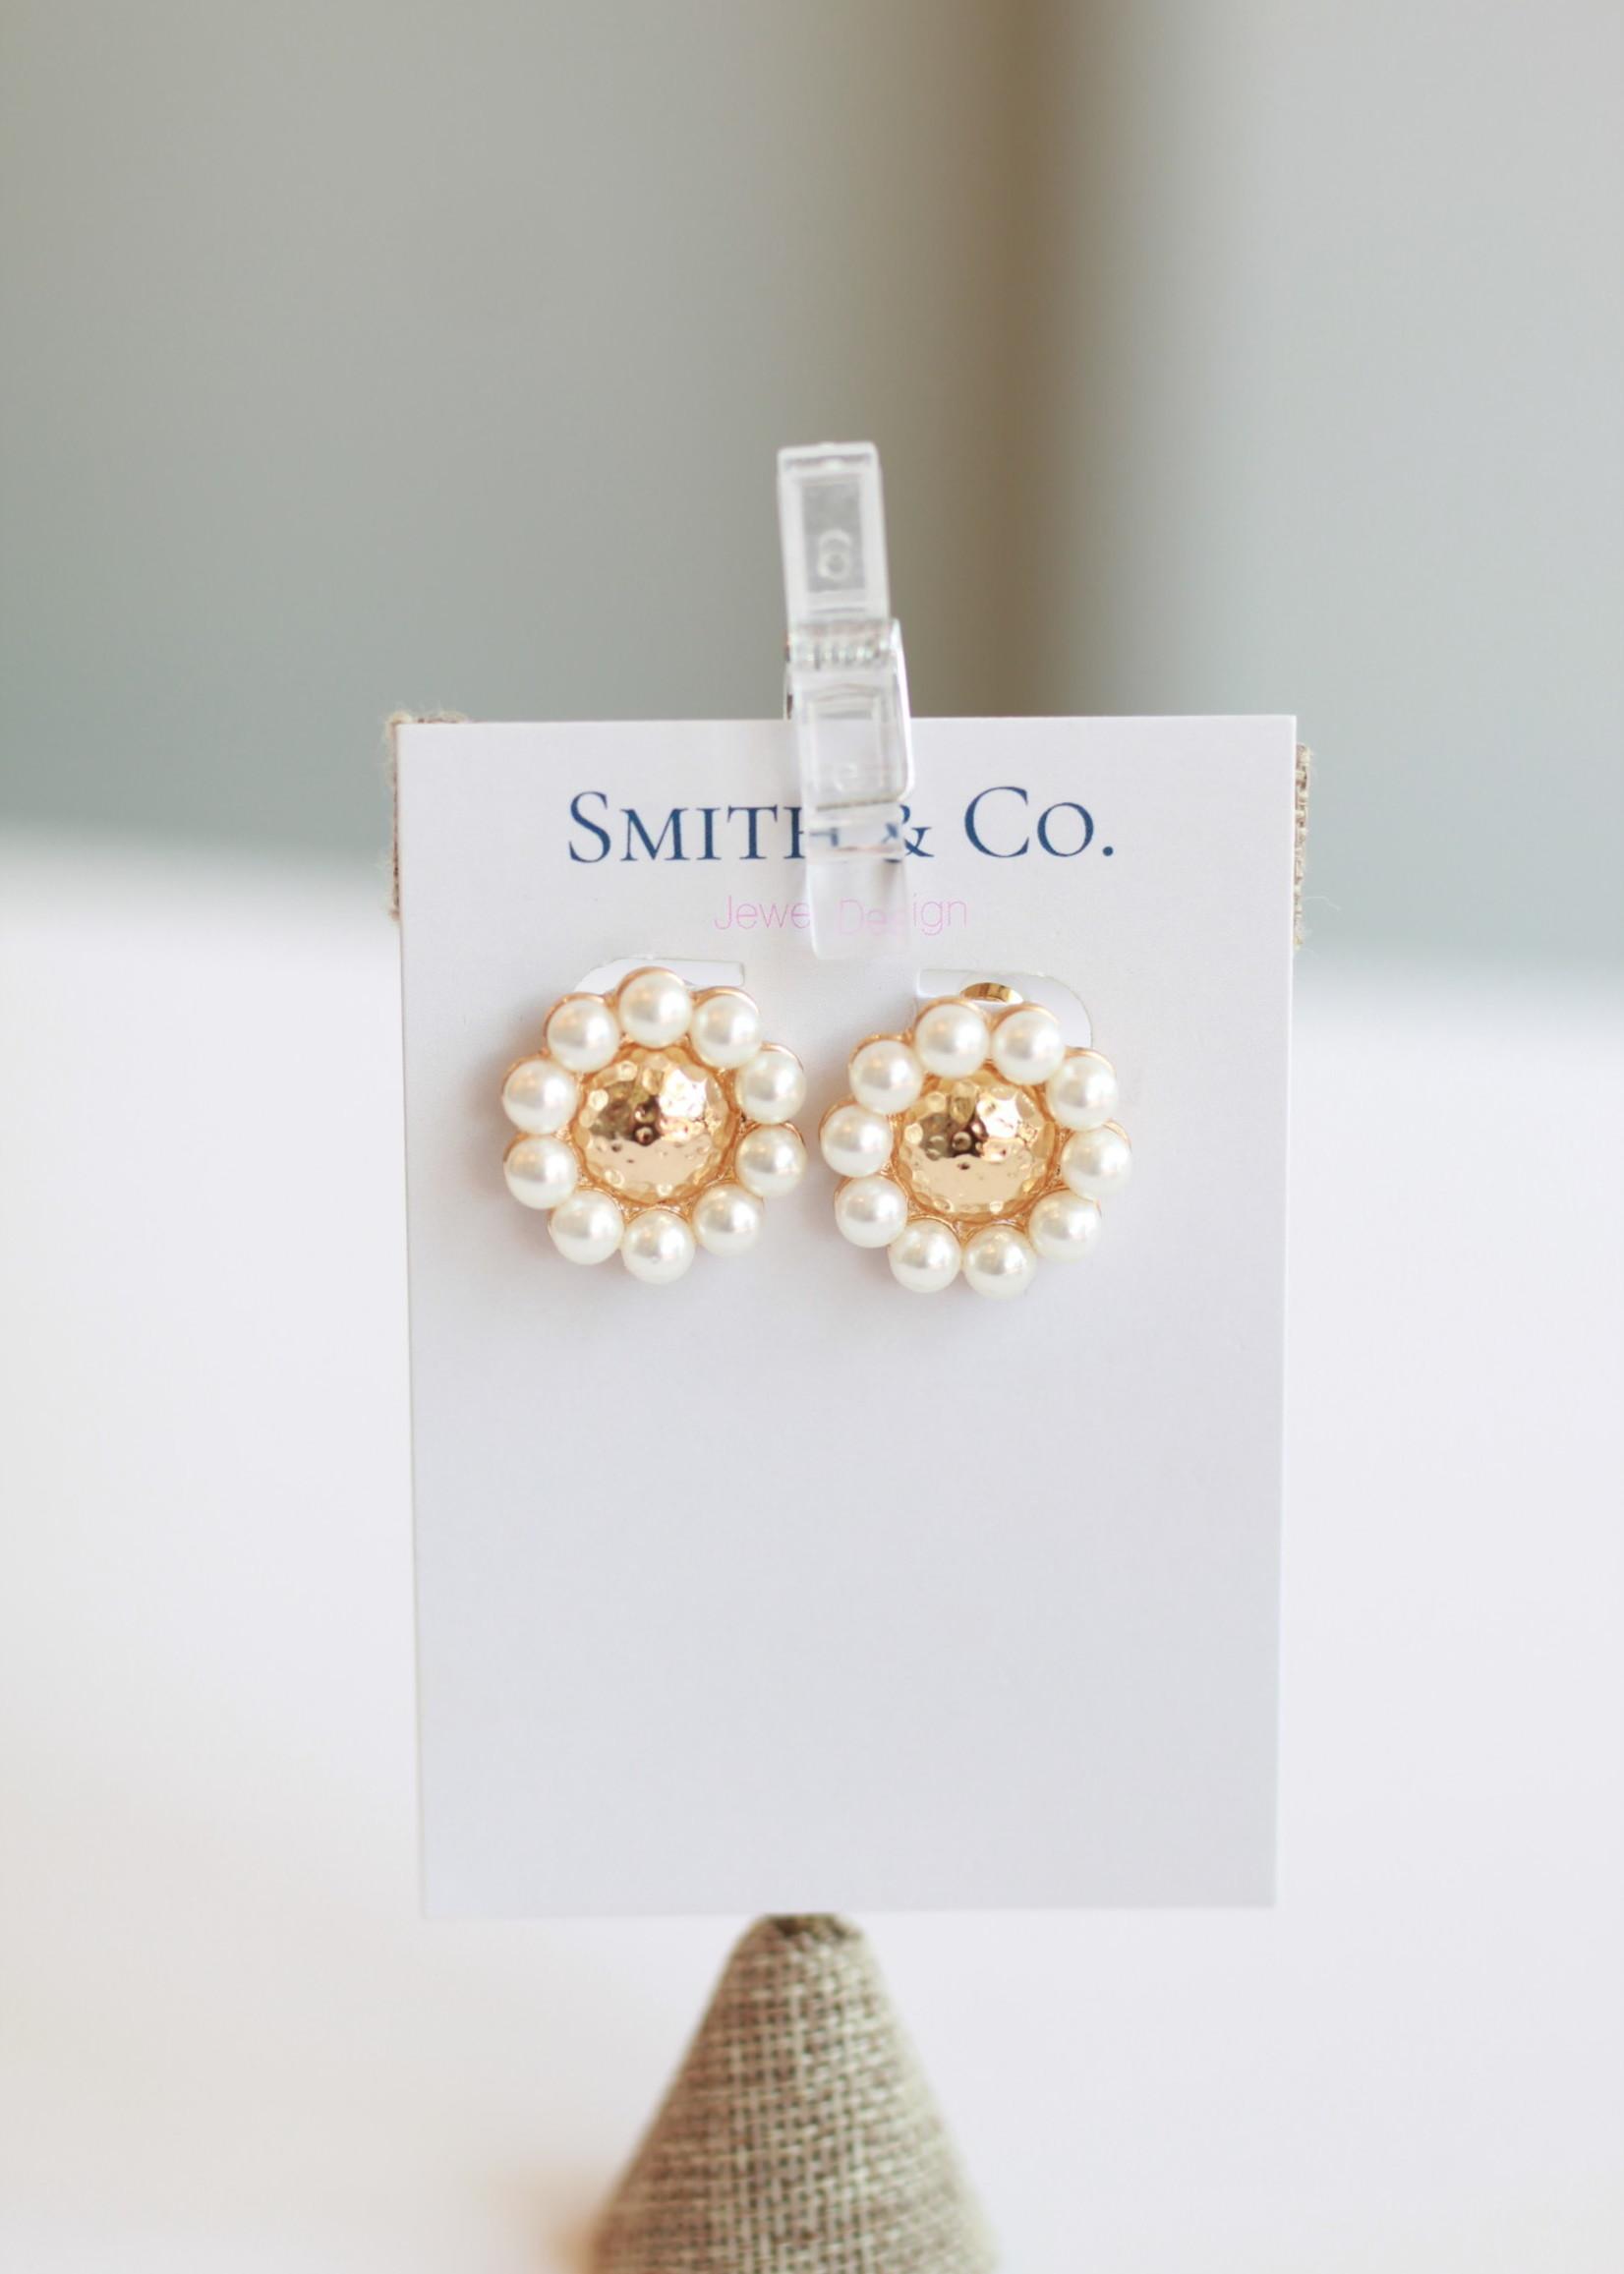 Smith & Co LS Sunshine Pearl Stud